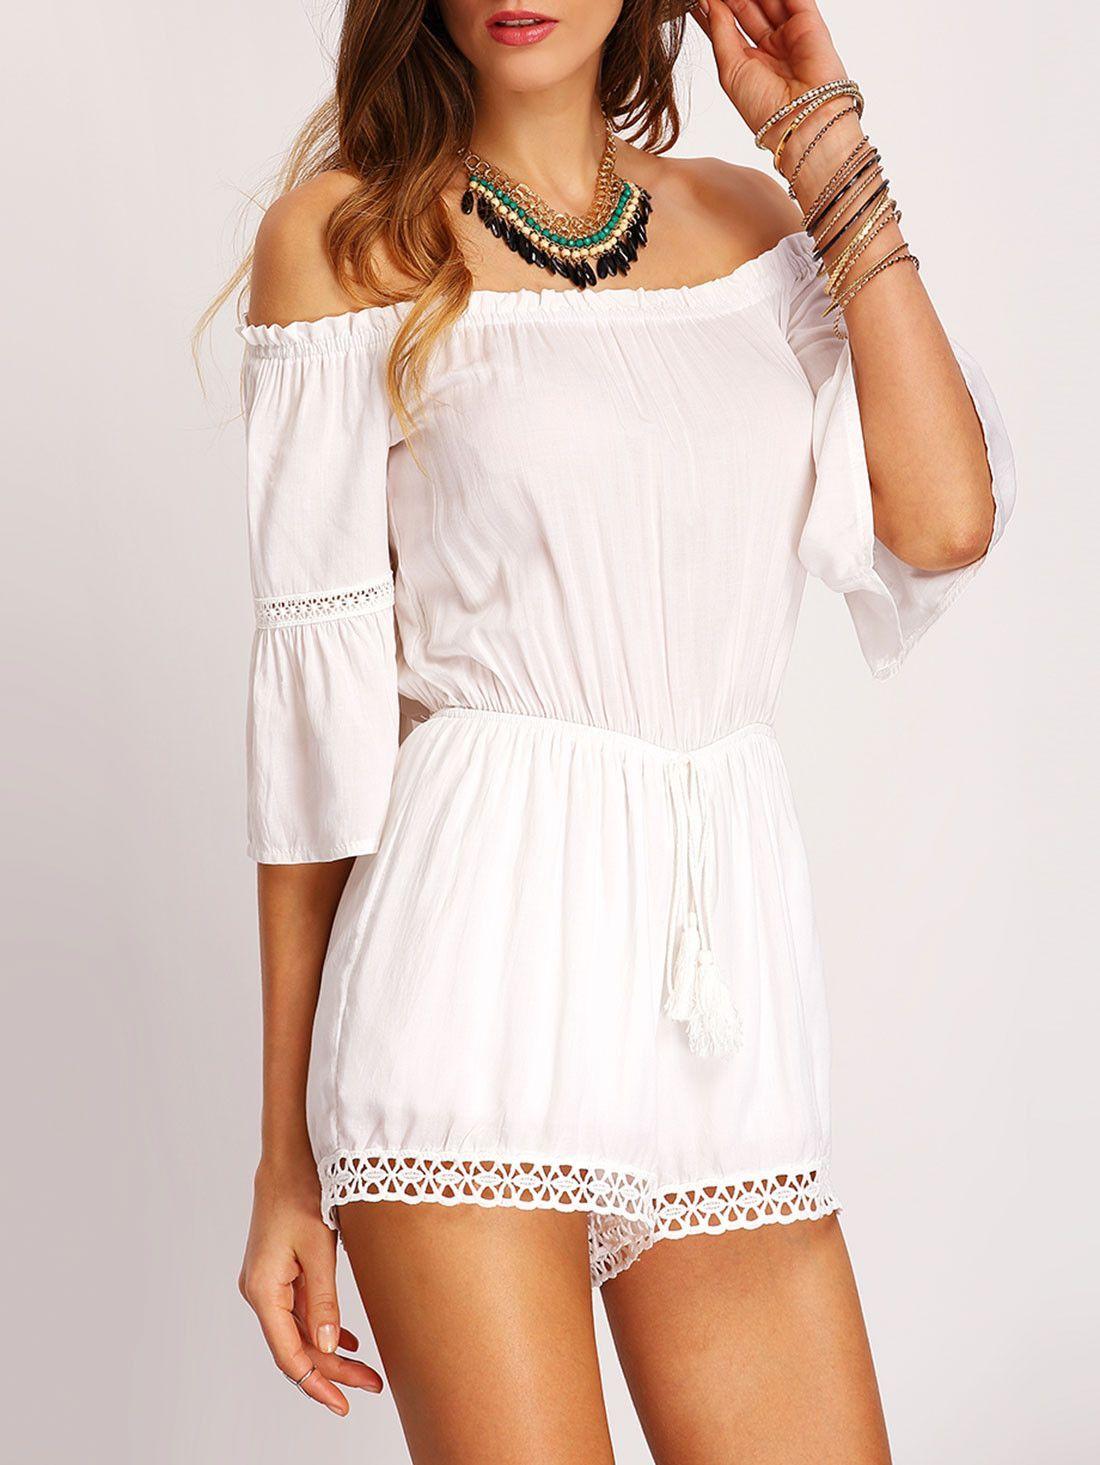 a8ce70edbc6d Trendy white off the shoulder romper. Summer white crochet jumpsuit. Casual  rompers